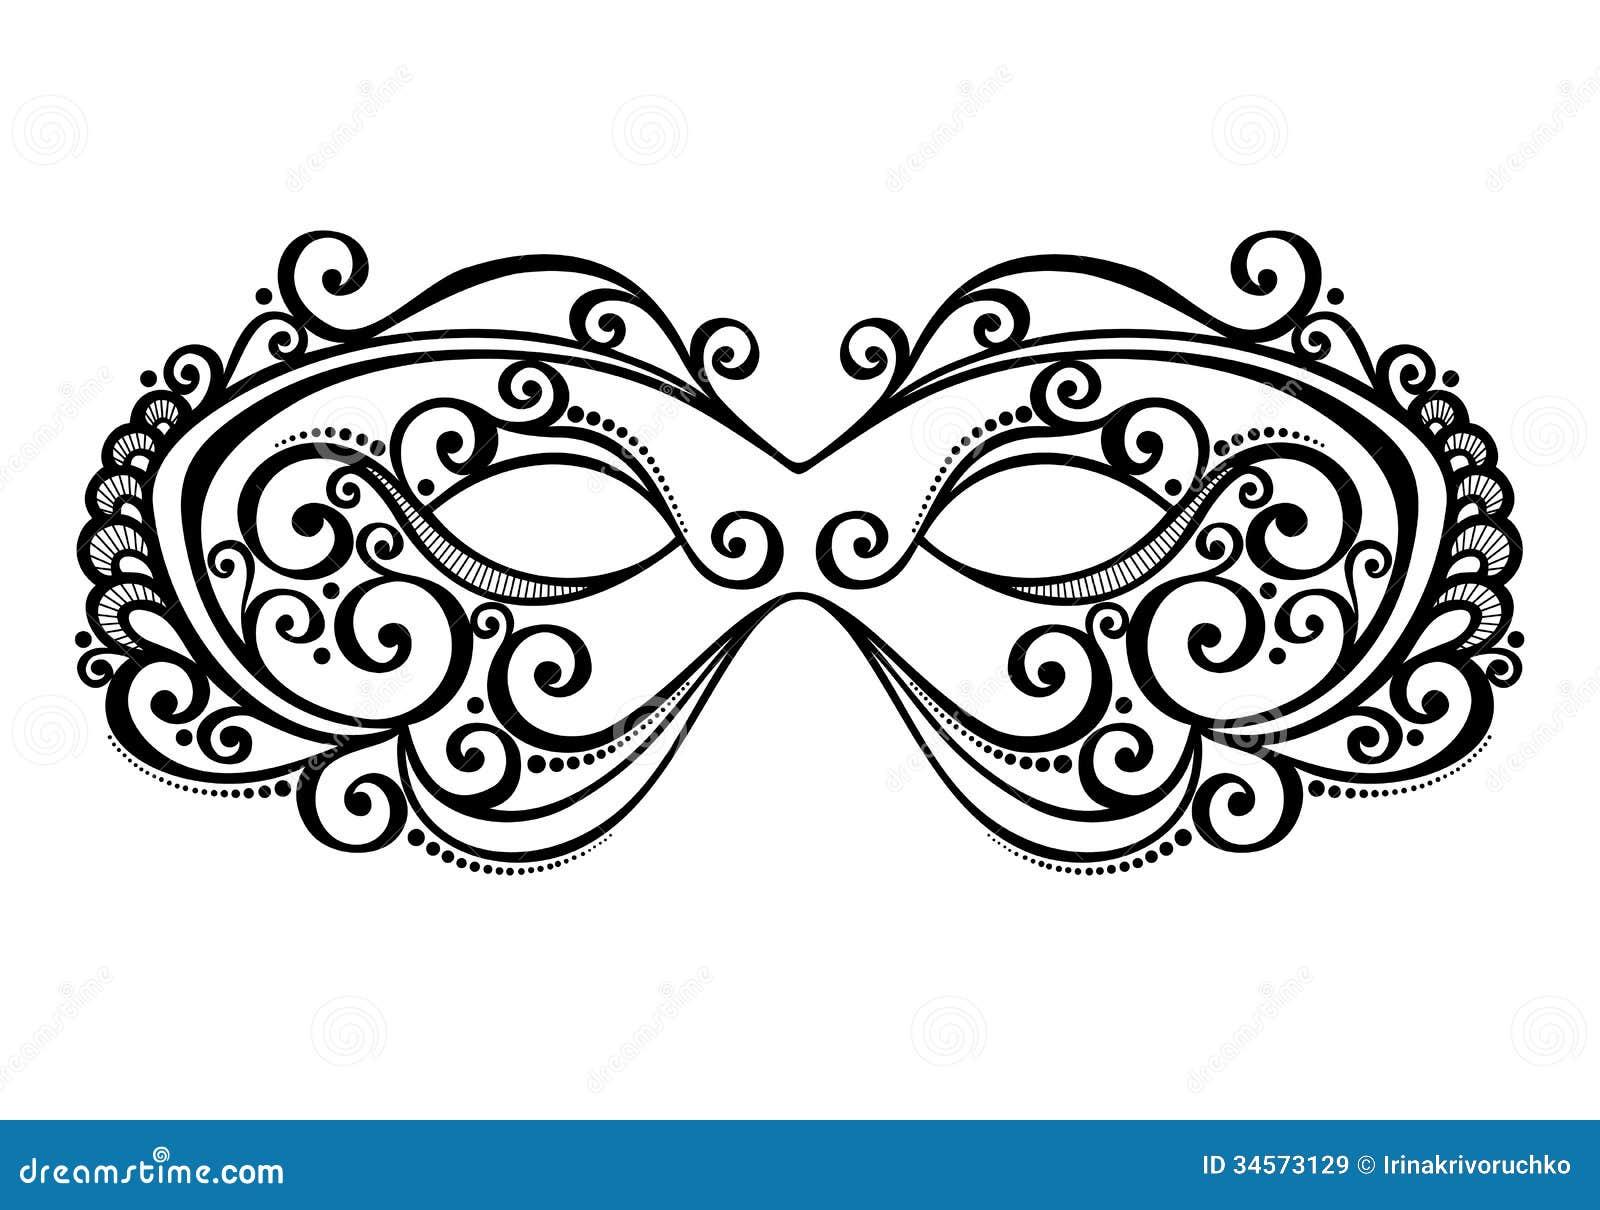 Masquerade Mask Royalty Free Stock Images Image 34573129